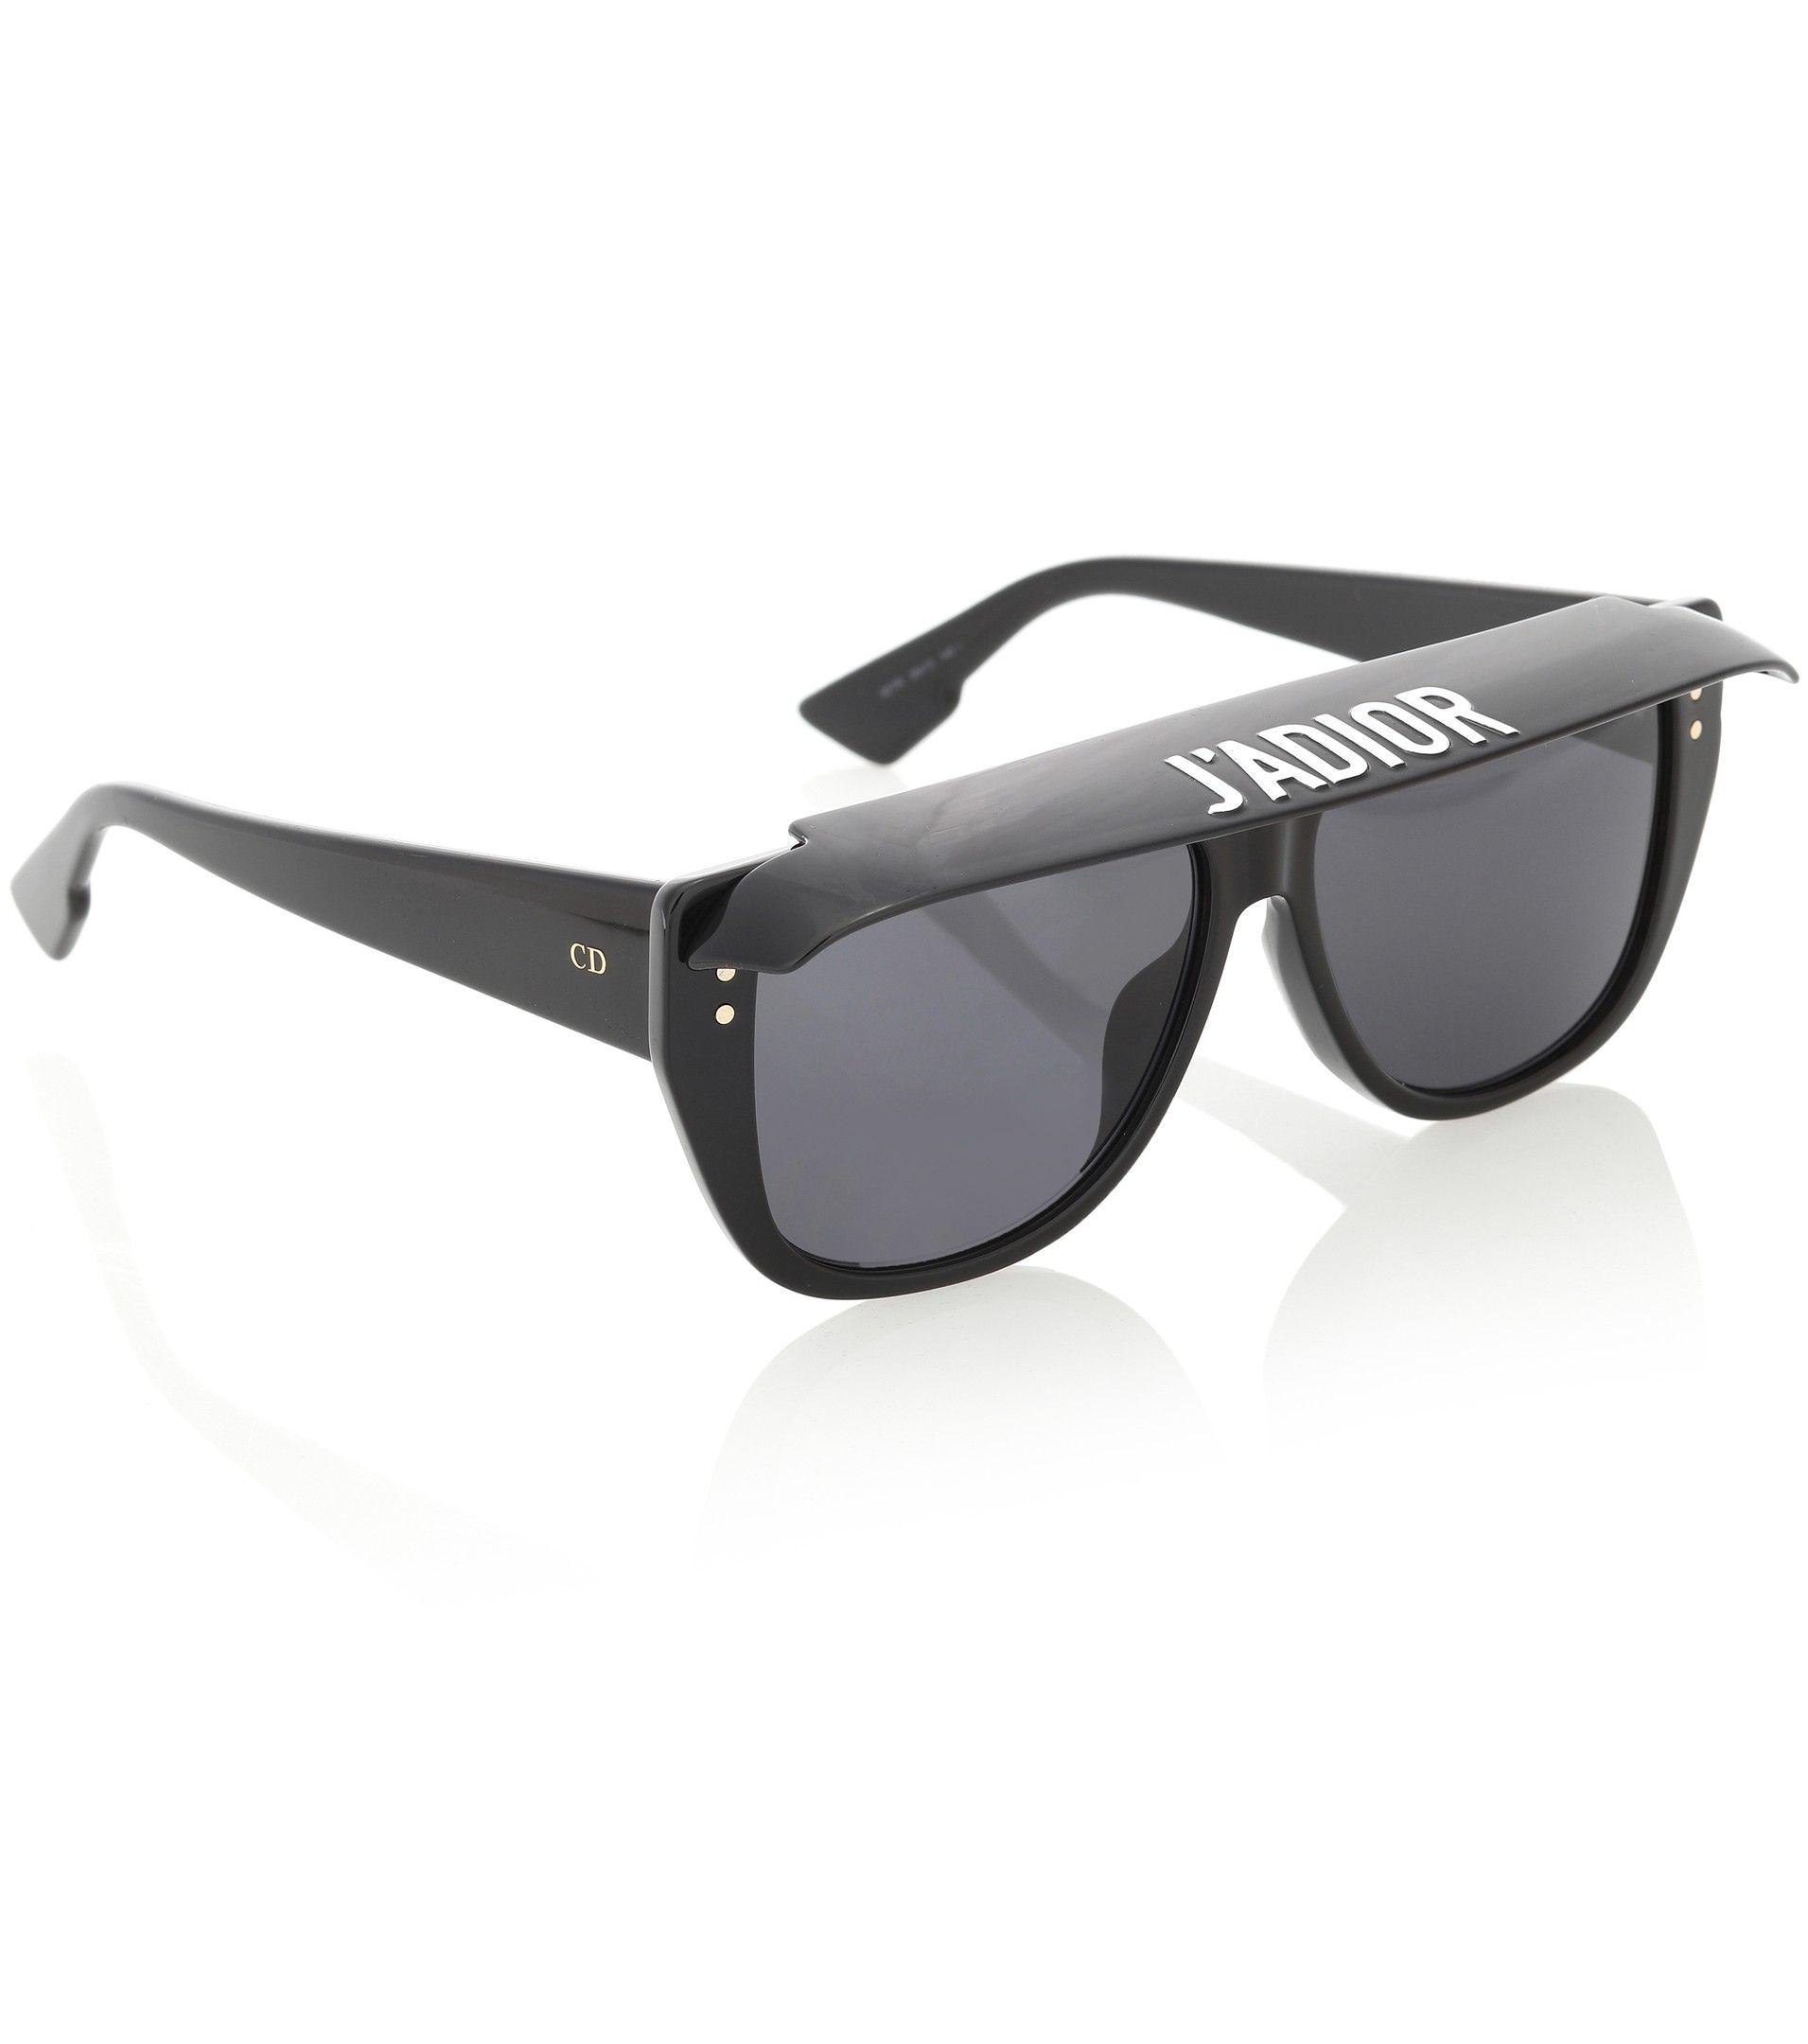 1b7de55ad19 Dior Sunglasses - J ADIOR visor sunglasses